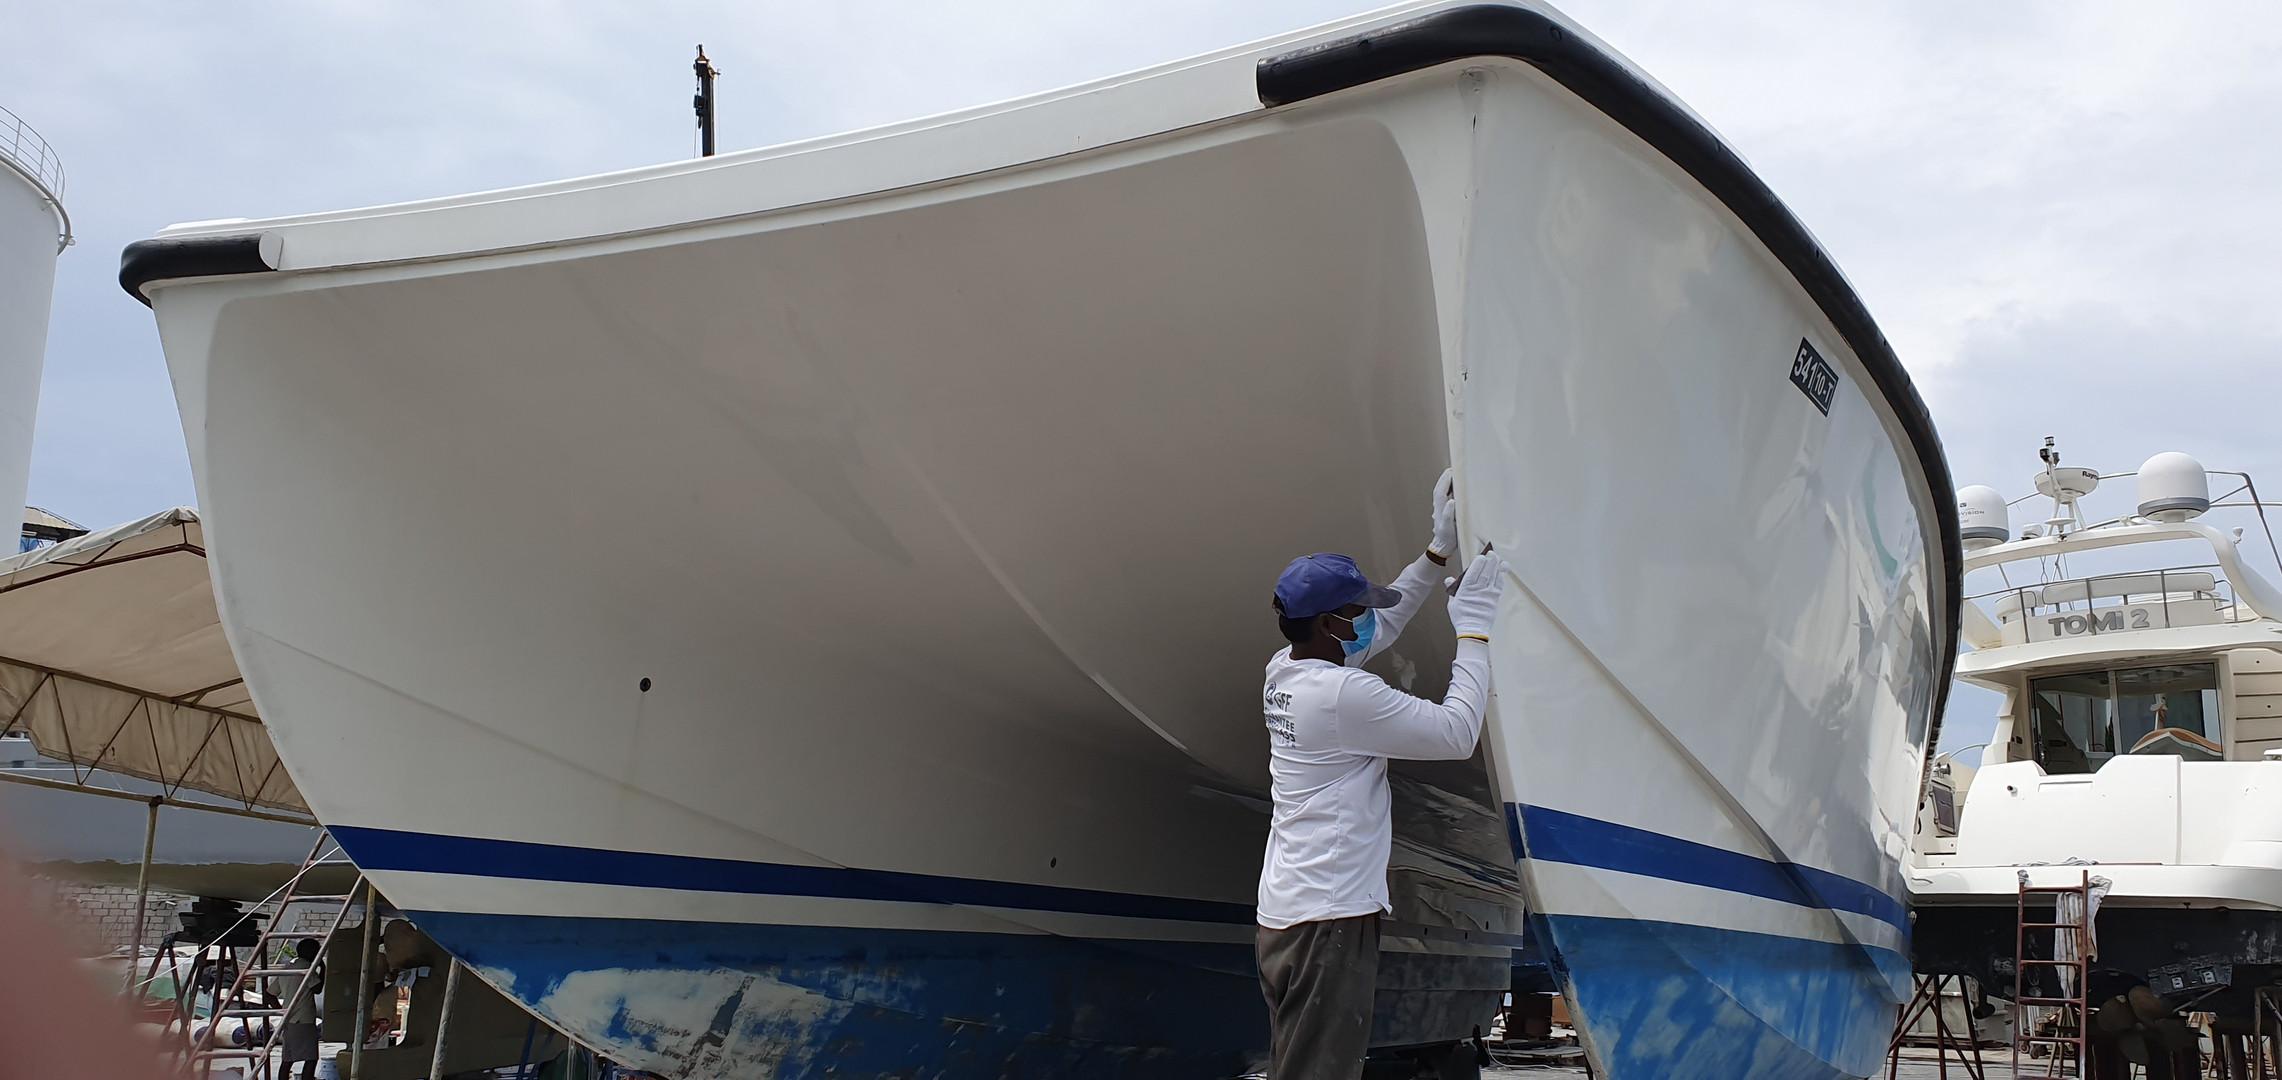 Jalboot Maldives Al-Jumana Repair